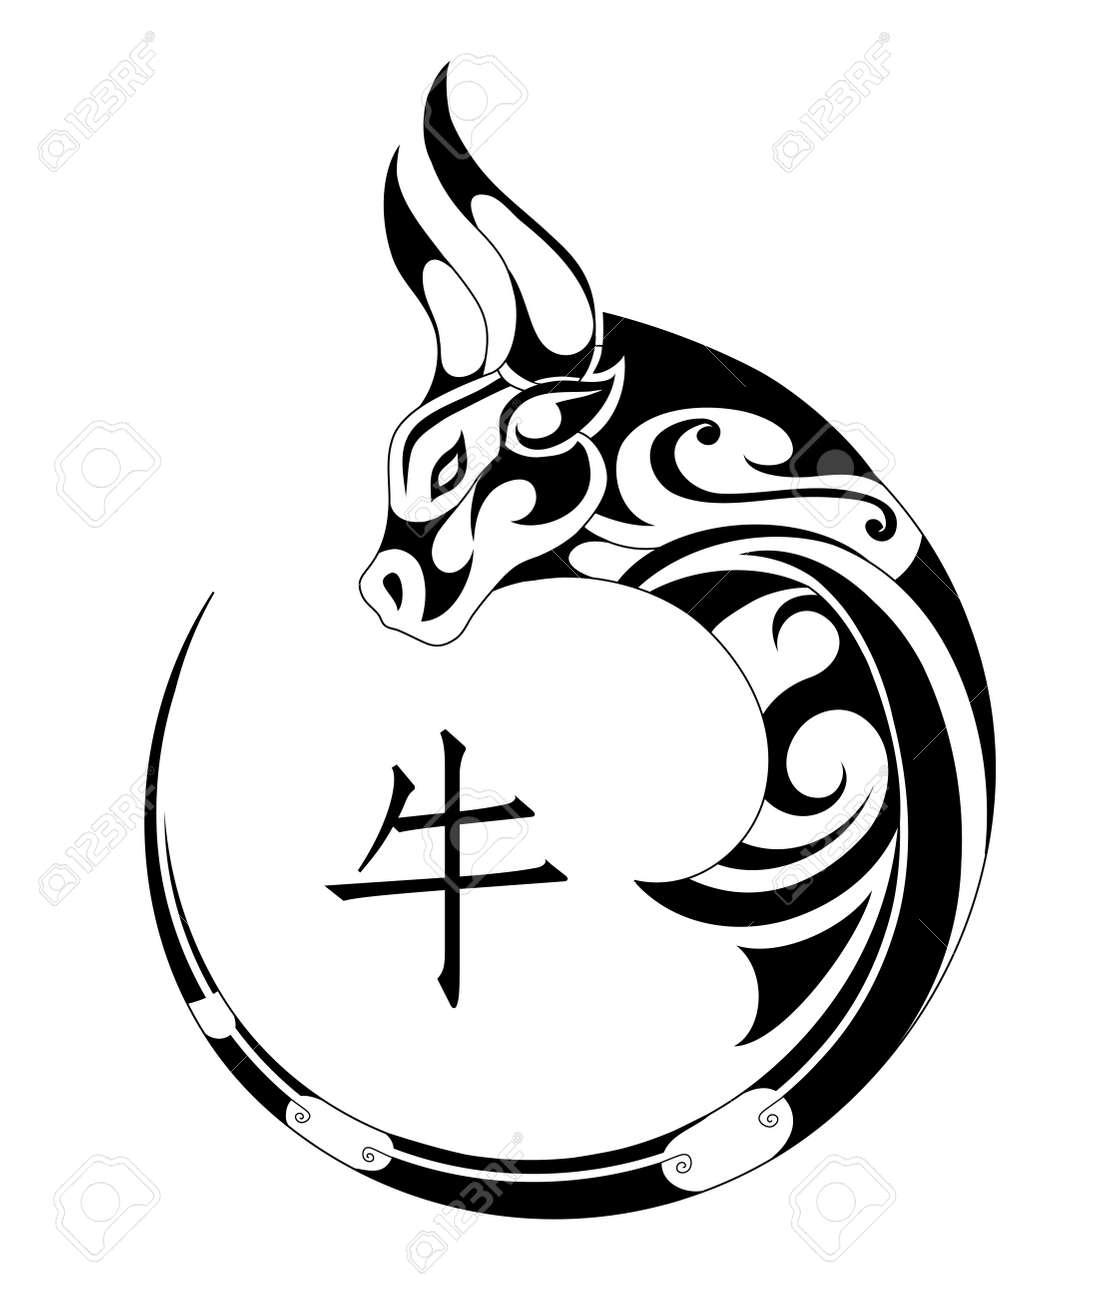 Ox tribal tattoo chinese zodiac symbol hieroglyph translation ox tribal tattoo chinese zodiac symbol hieroglyph translation ox stock vector 71965227 biocorpaavc Gallery